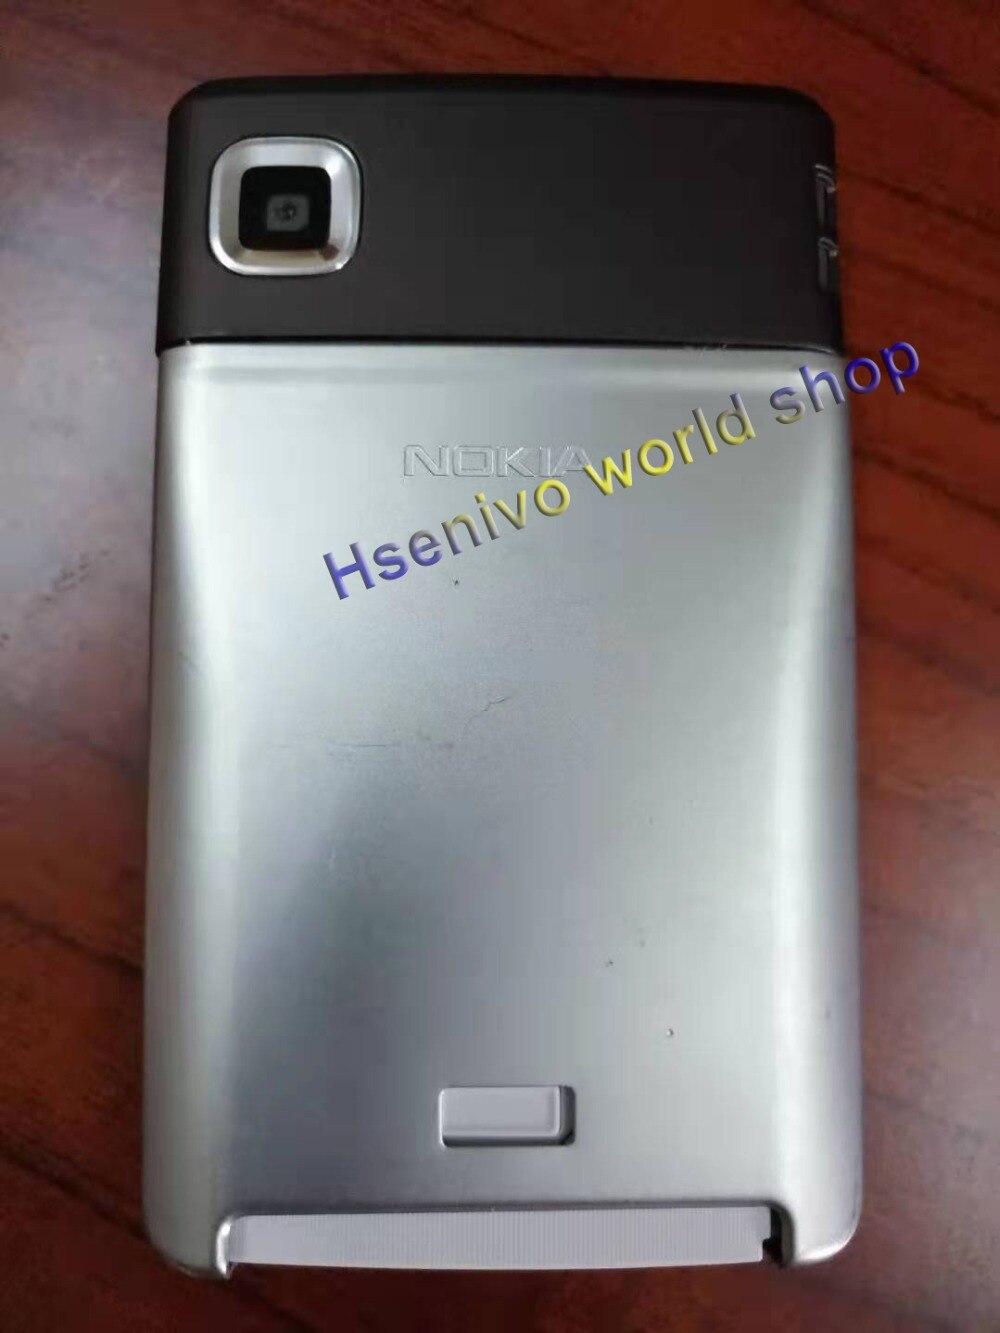 E61i Originele Unlocked Nokia E61 E61i GSM 3G WIFI Bluetooth Mobiele Telefoon Symbian OS 9.1 Met Multi taal gratis verzending - 3